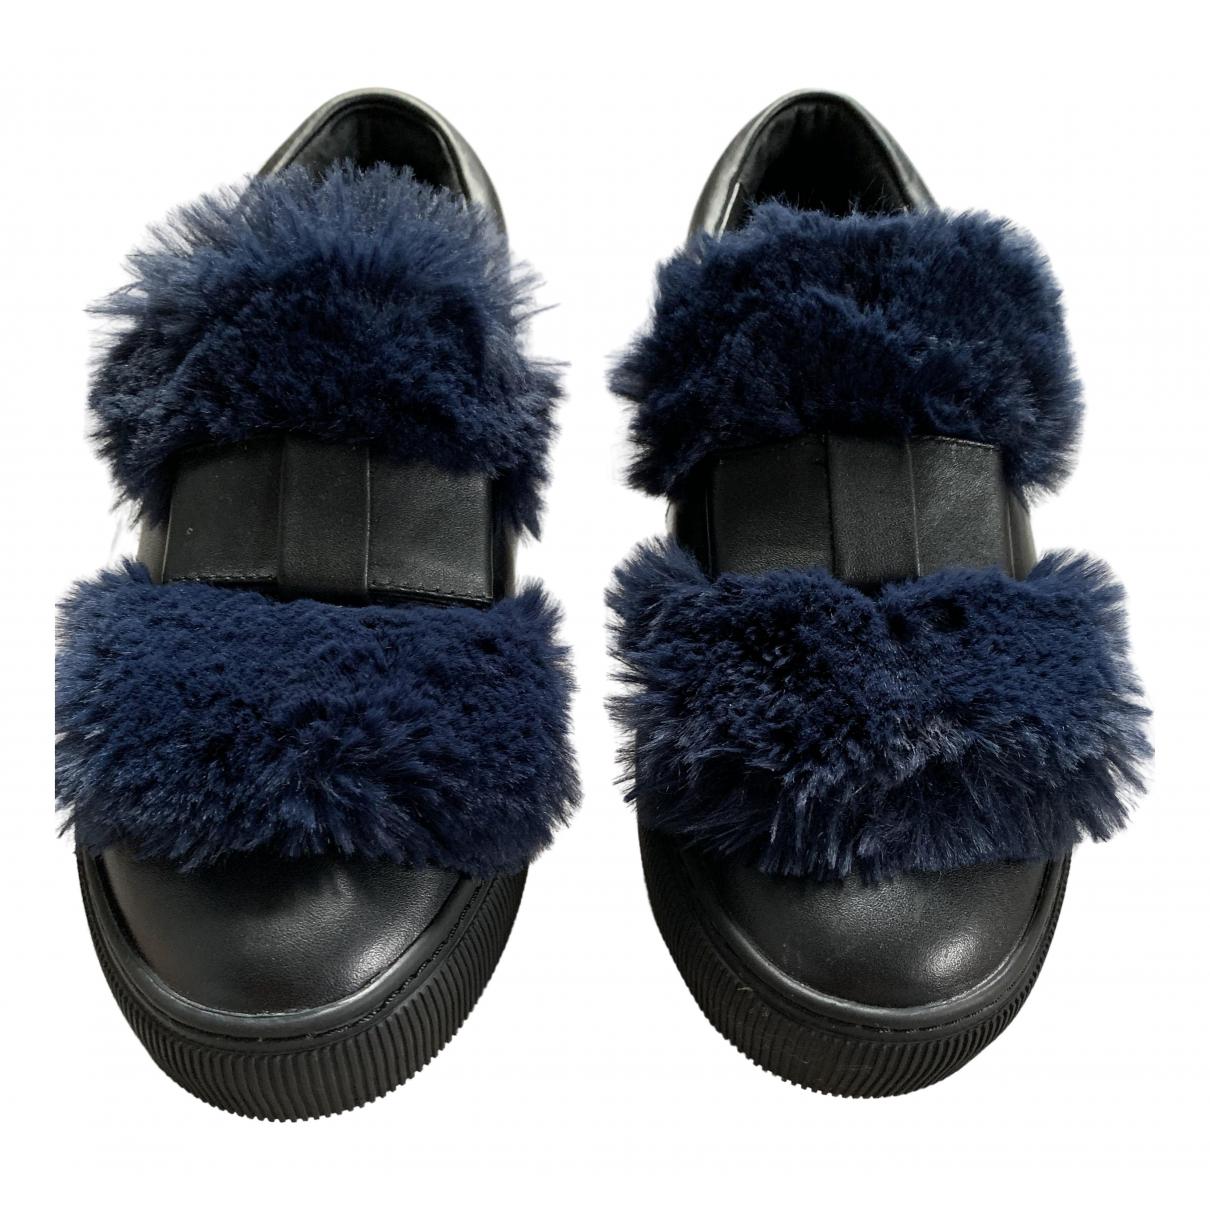 Karl Lagerfeld - Baskets   pour femme en cuir - noir